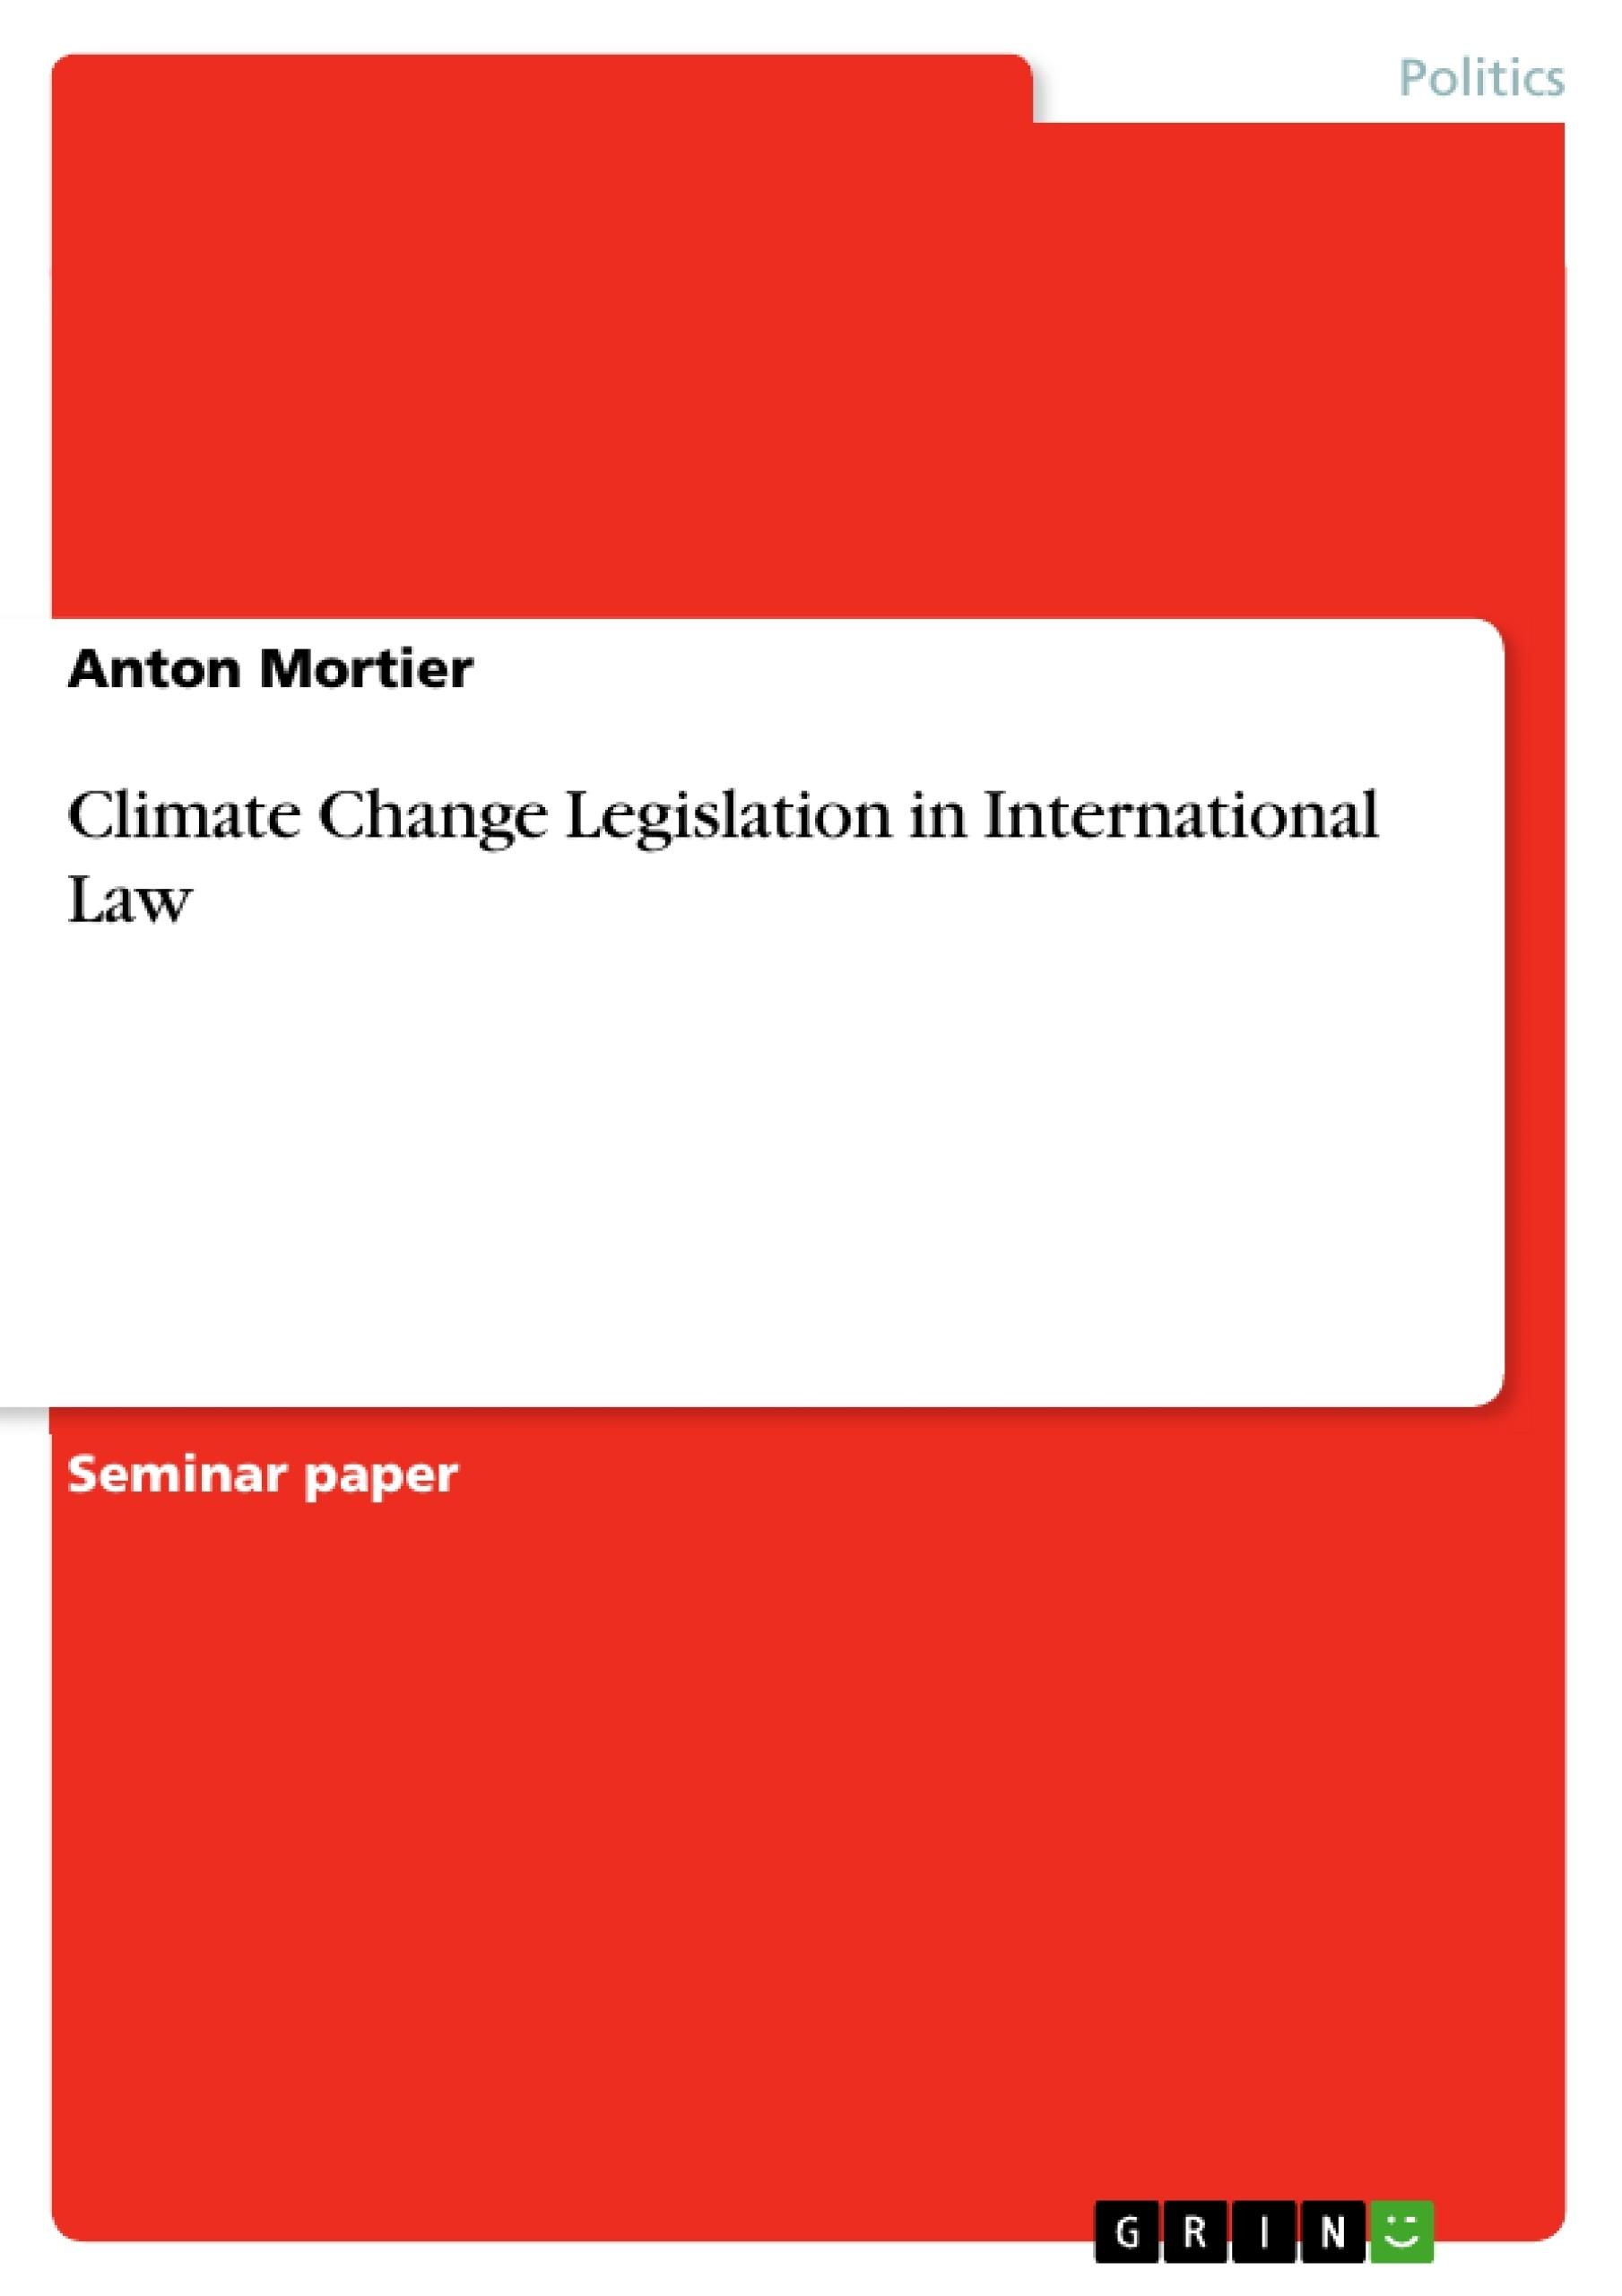 Title: Climate Change Legislation in International Law